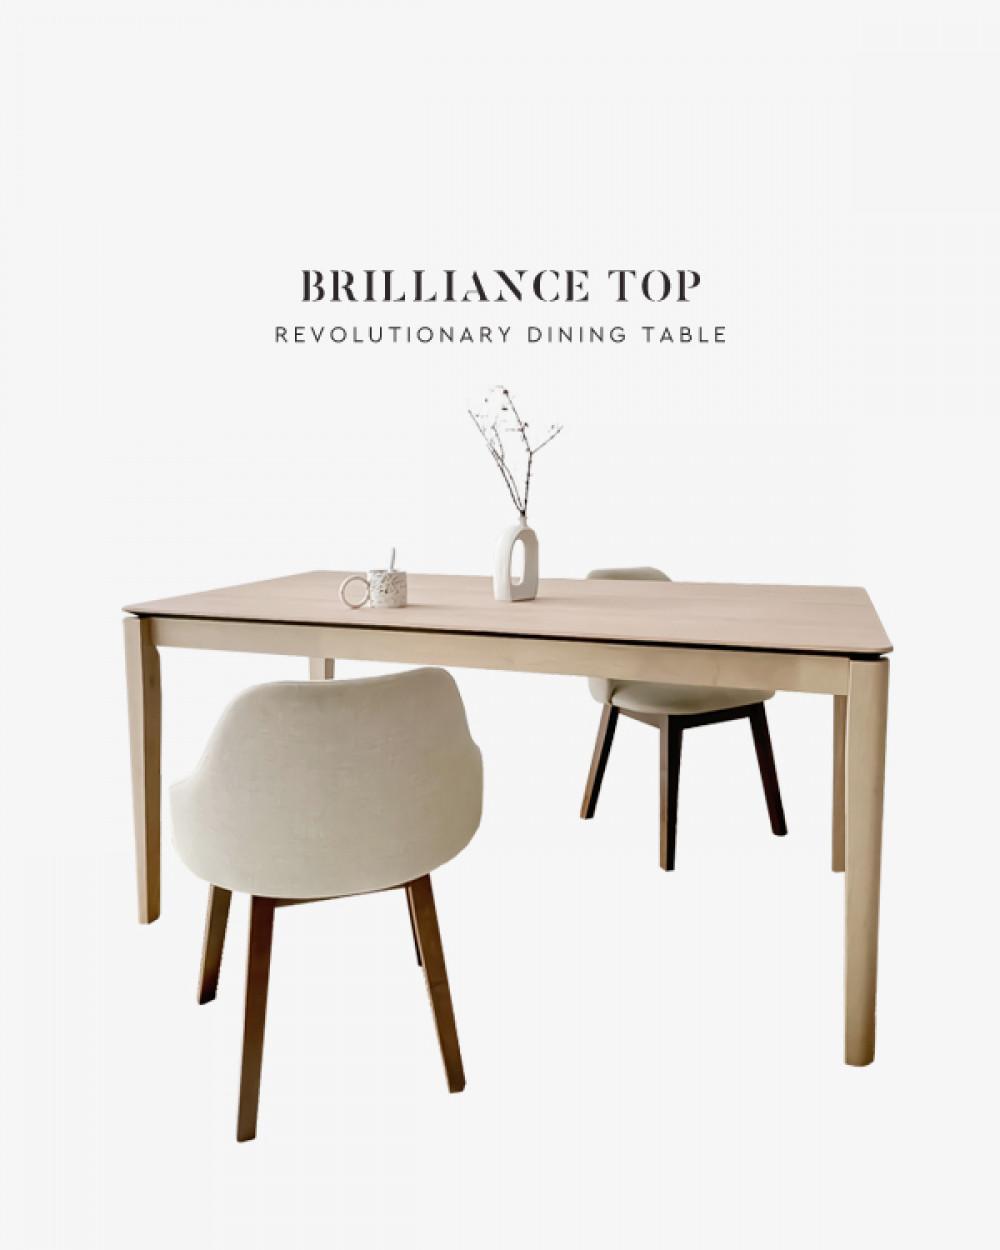 Brilliance Top | Kleberg Dining Table, Artisan Oak